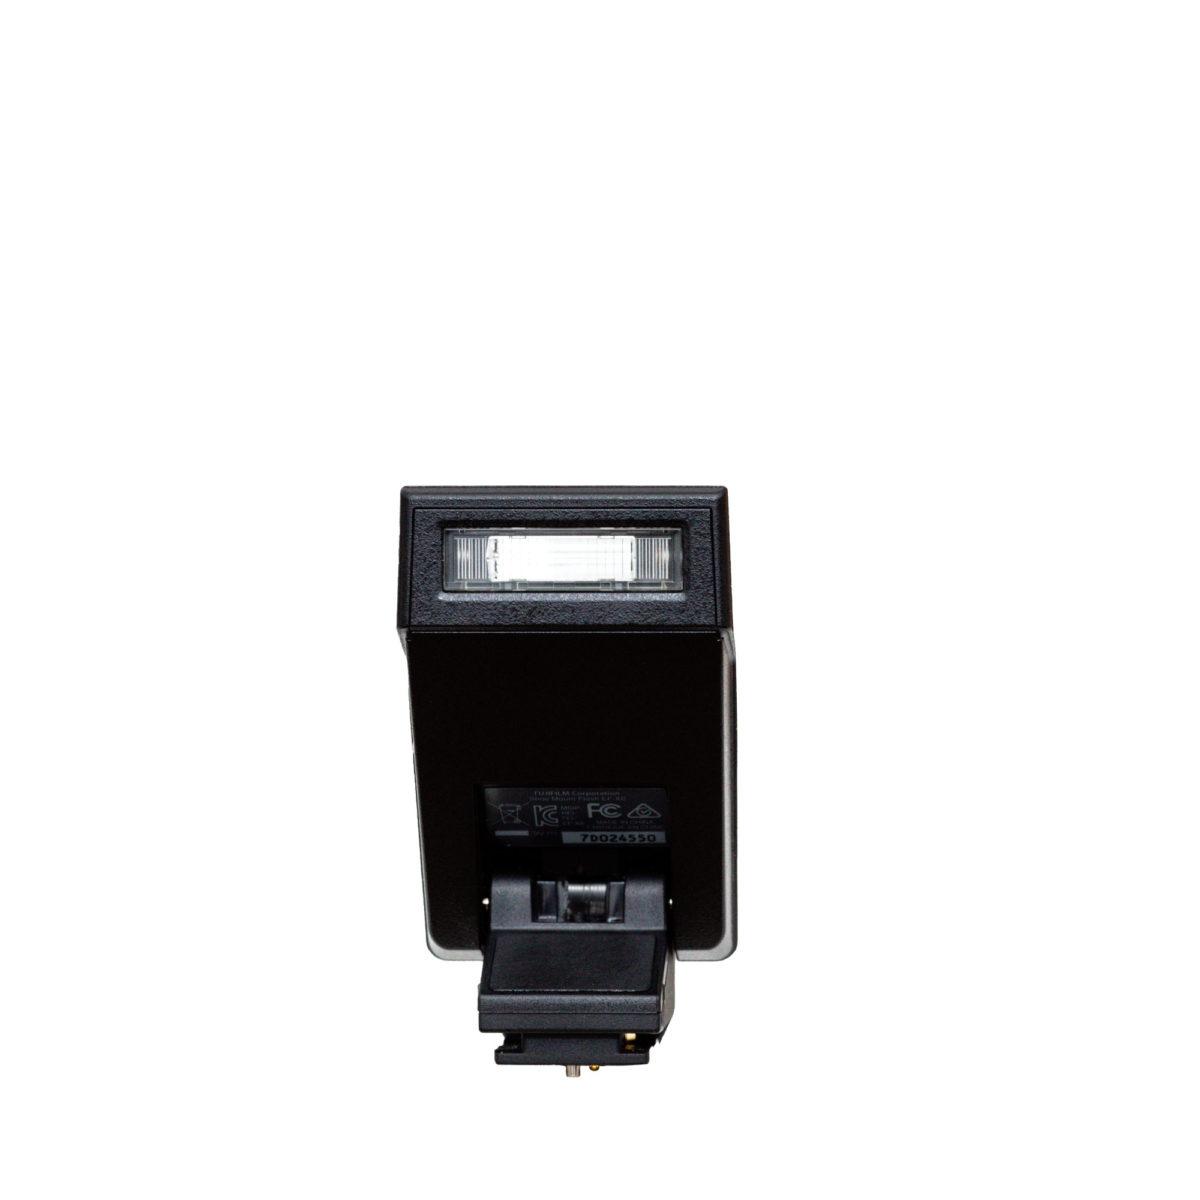 Fujifilm Blitzgerät EF-X8 kostenlos zur Kamera dazu mieten.